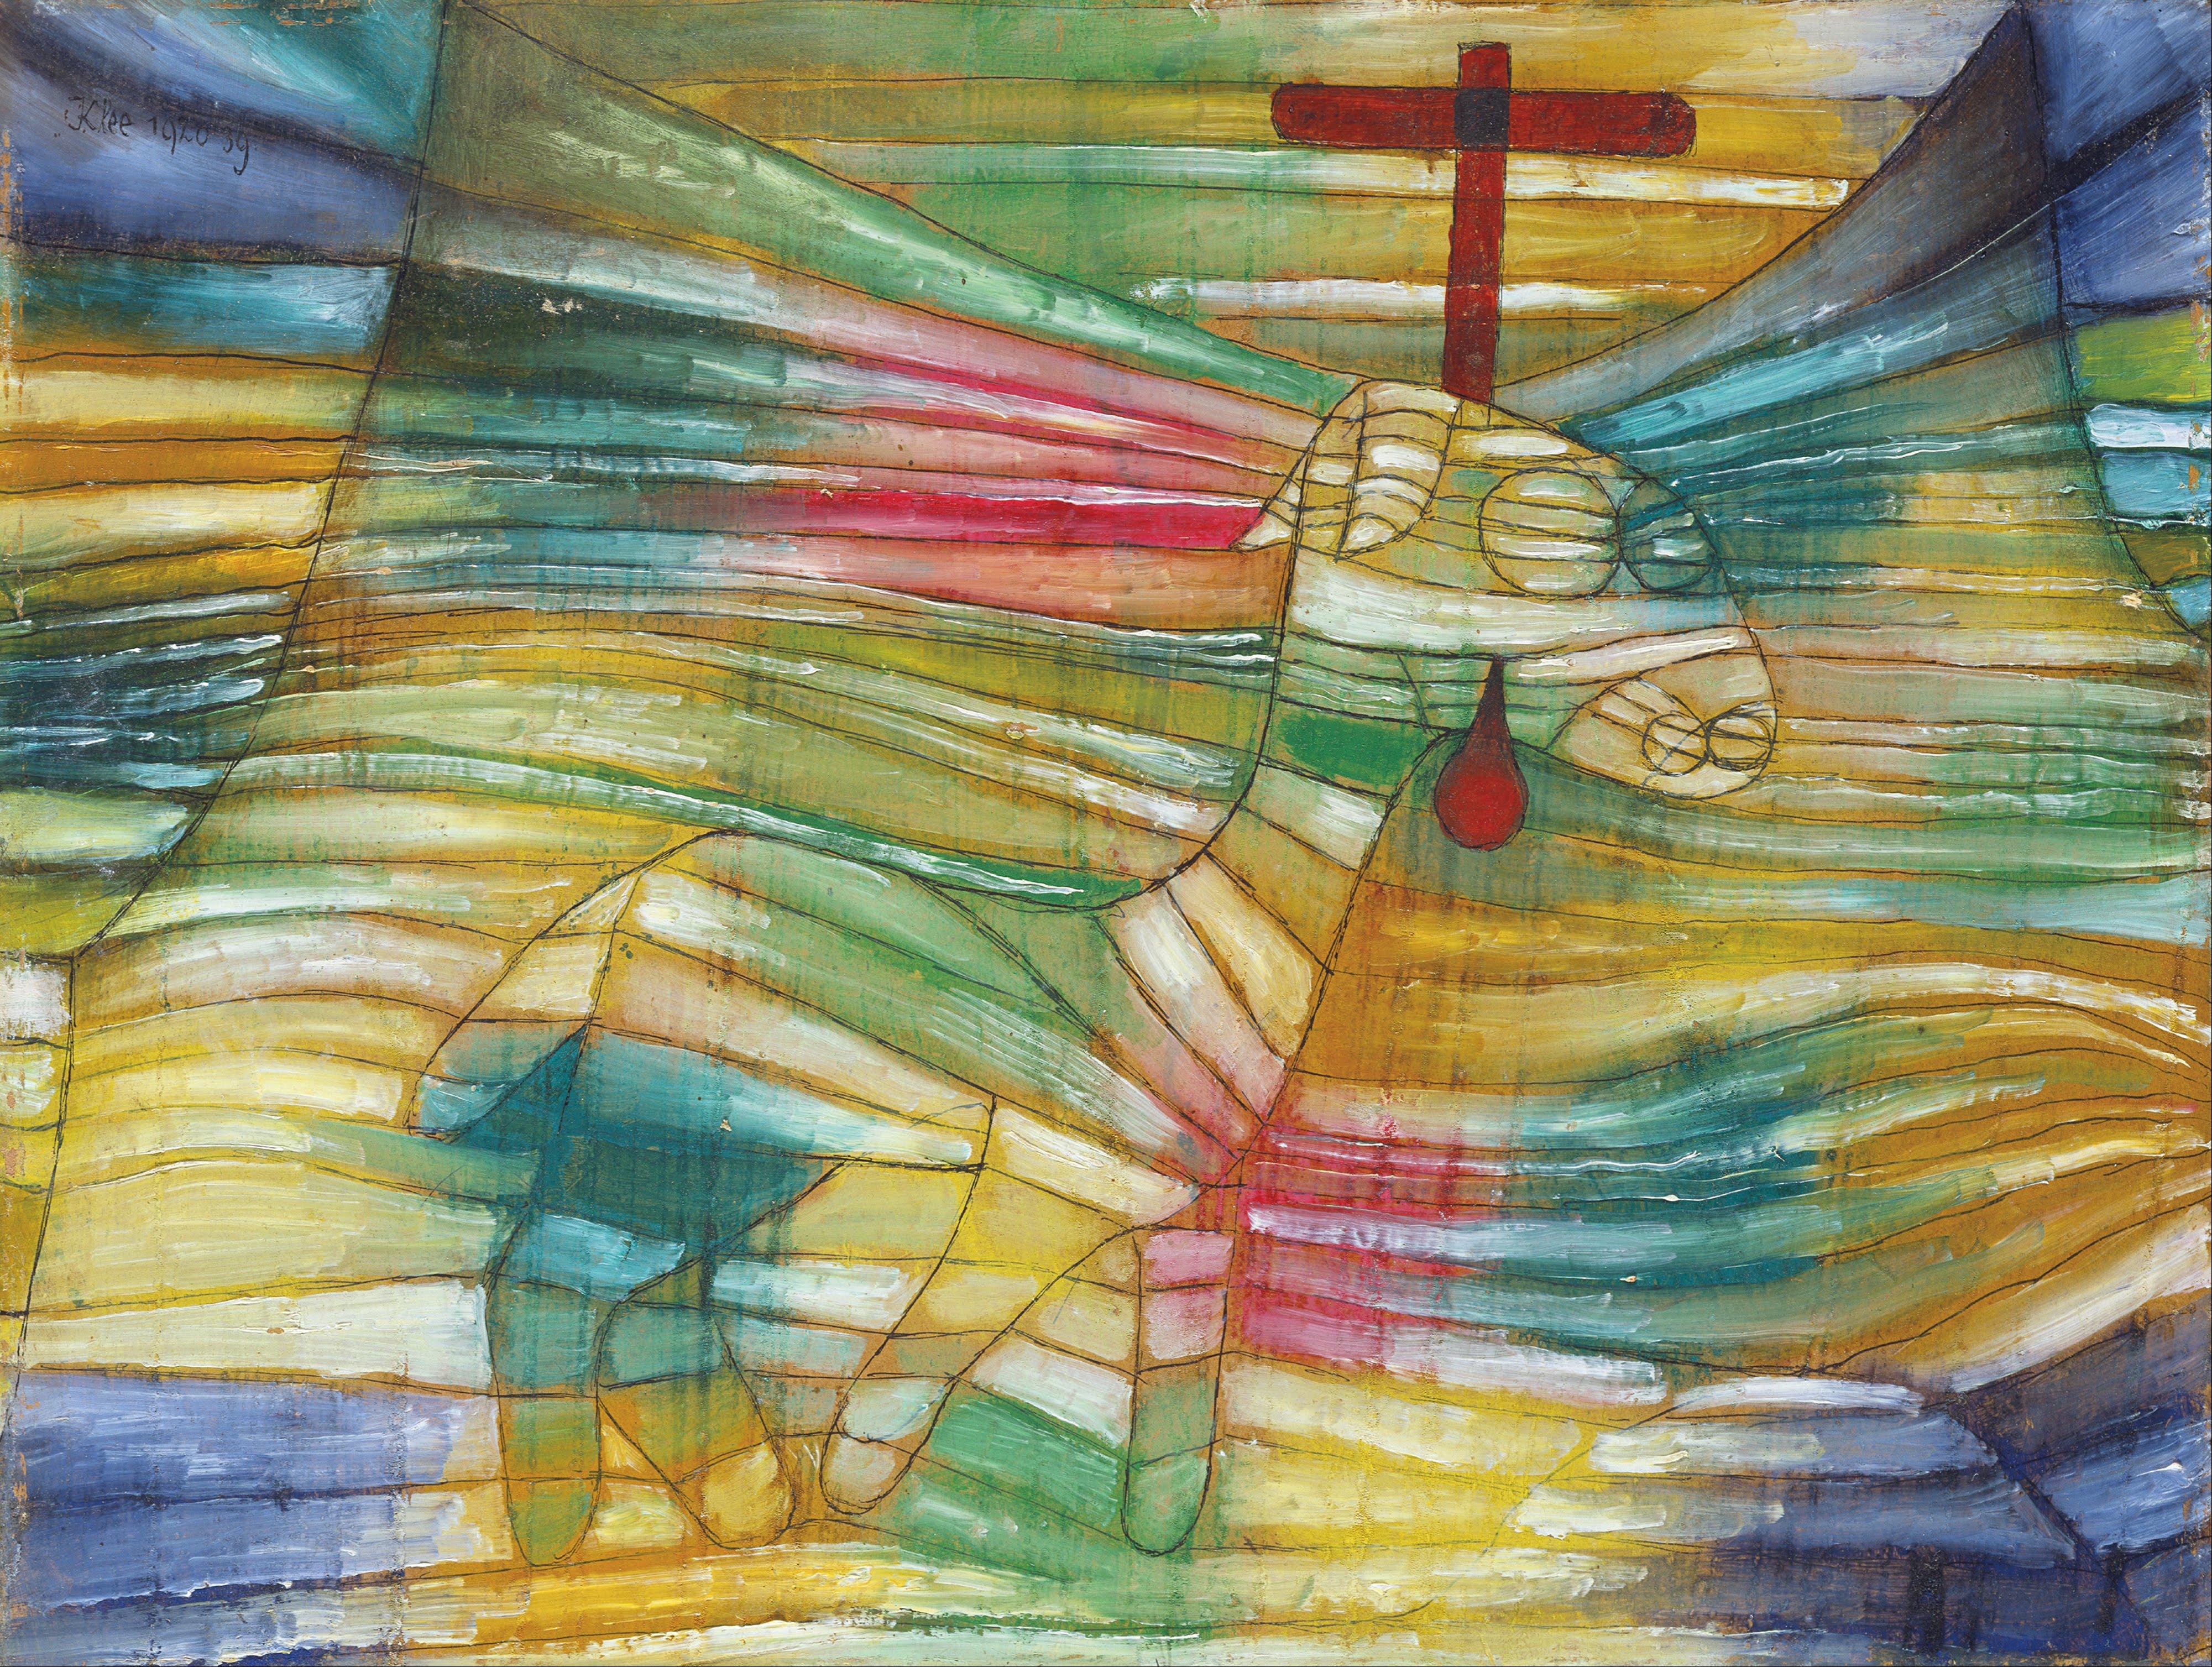 Glcolor Material Artwork Painting Art Publicdomain Surrealism Expressionism Bauhaus Paulklee Cubism Mural Modern Art Impressionist